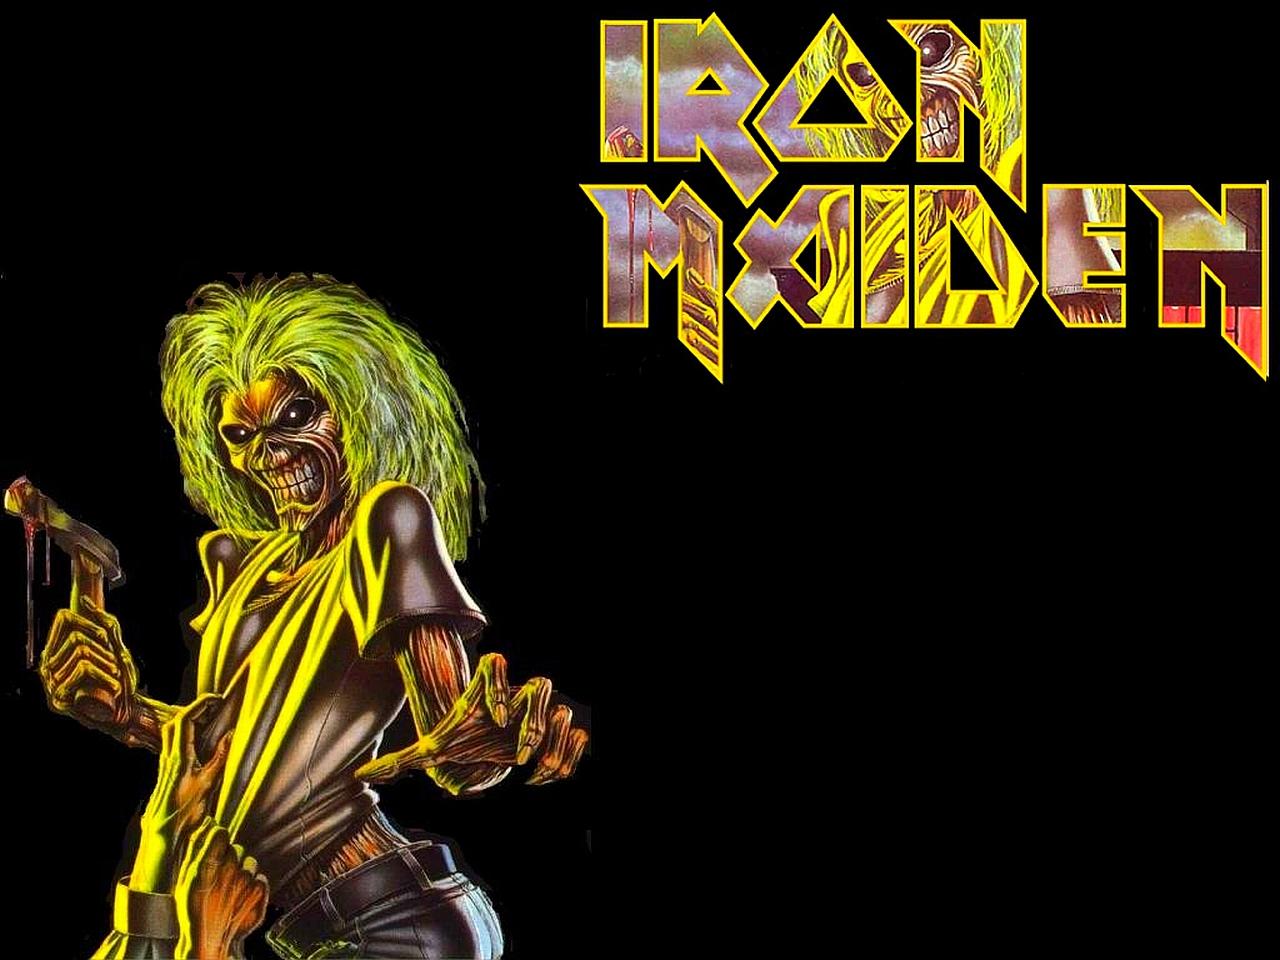 Iron Maiden Desktop Wallpaper: Iron Maiden Logo Wallpaper